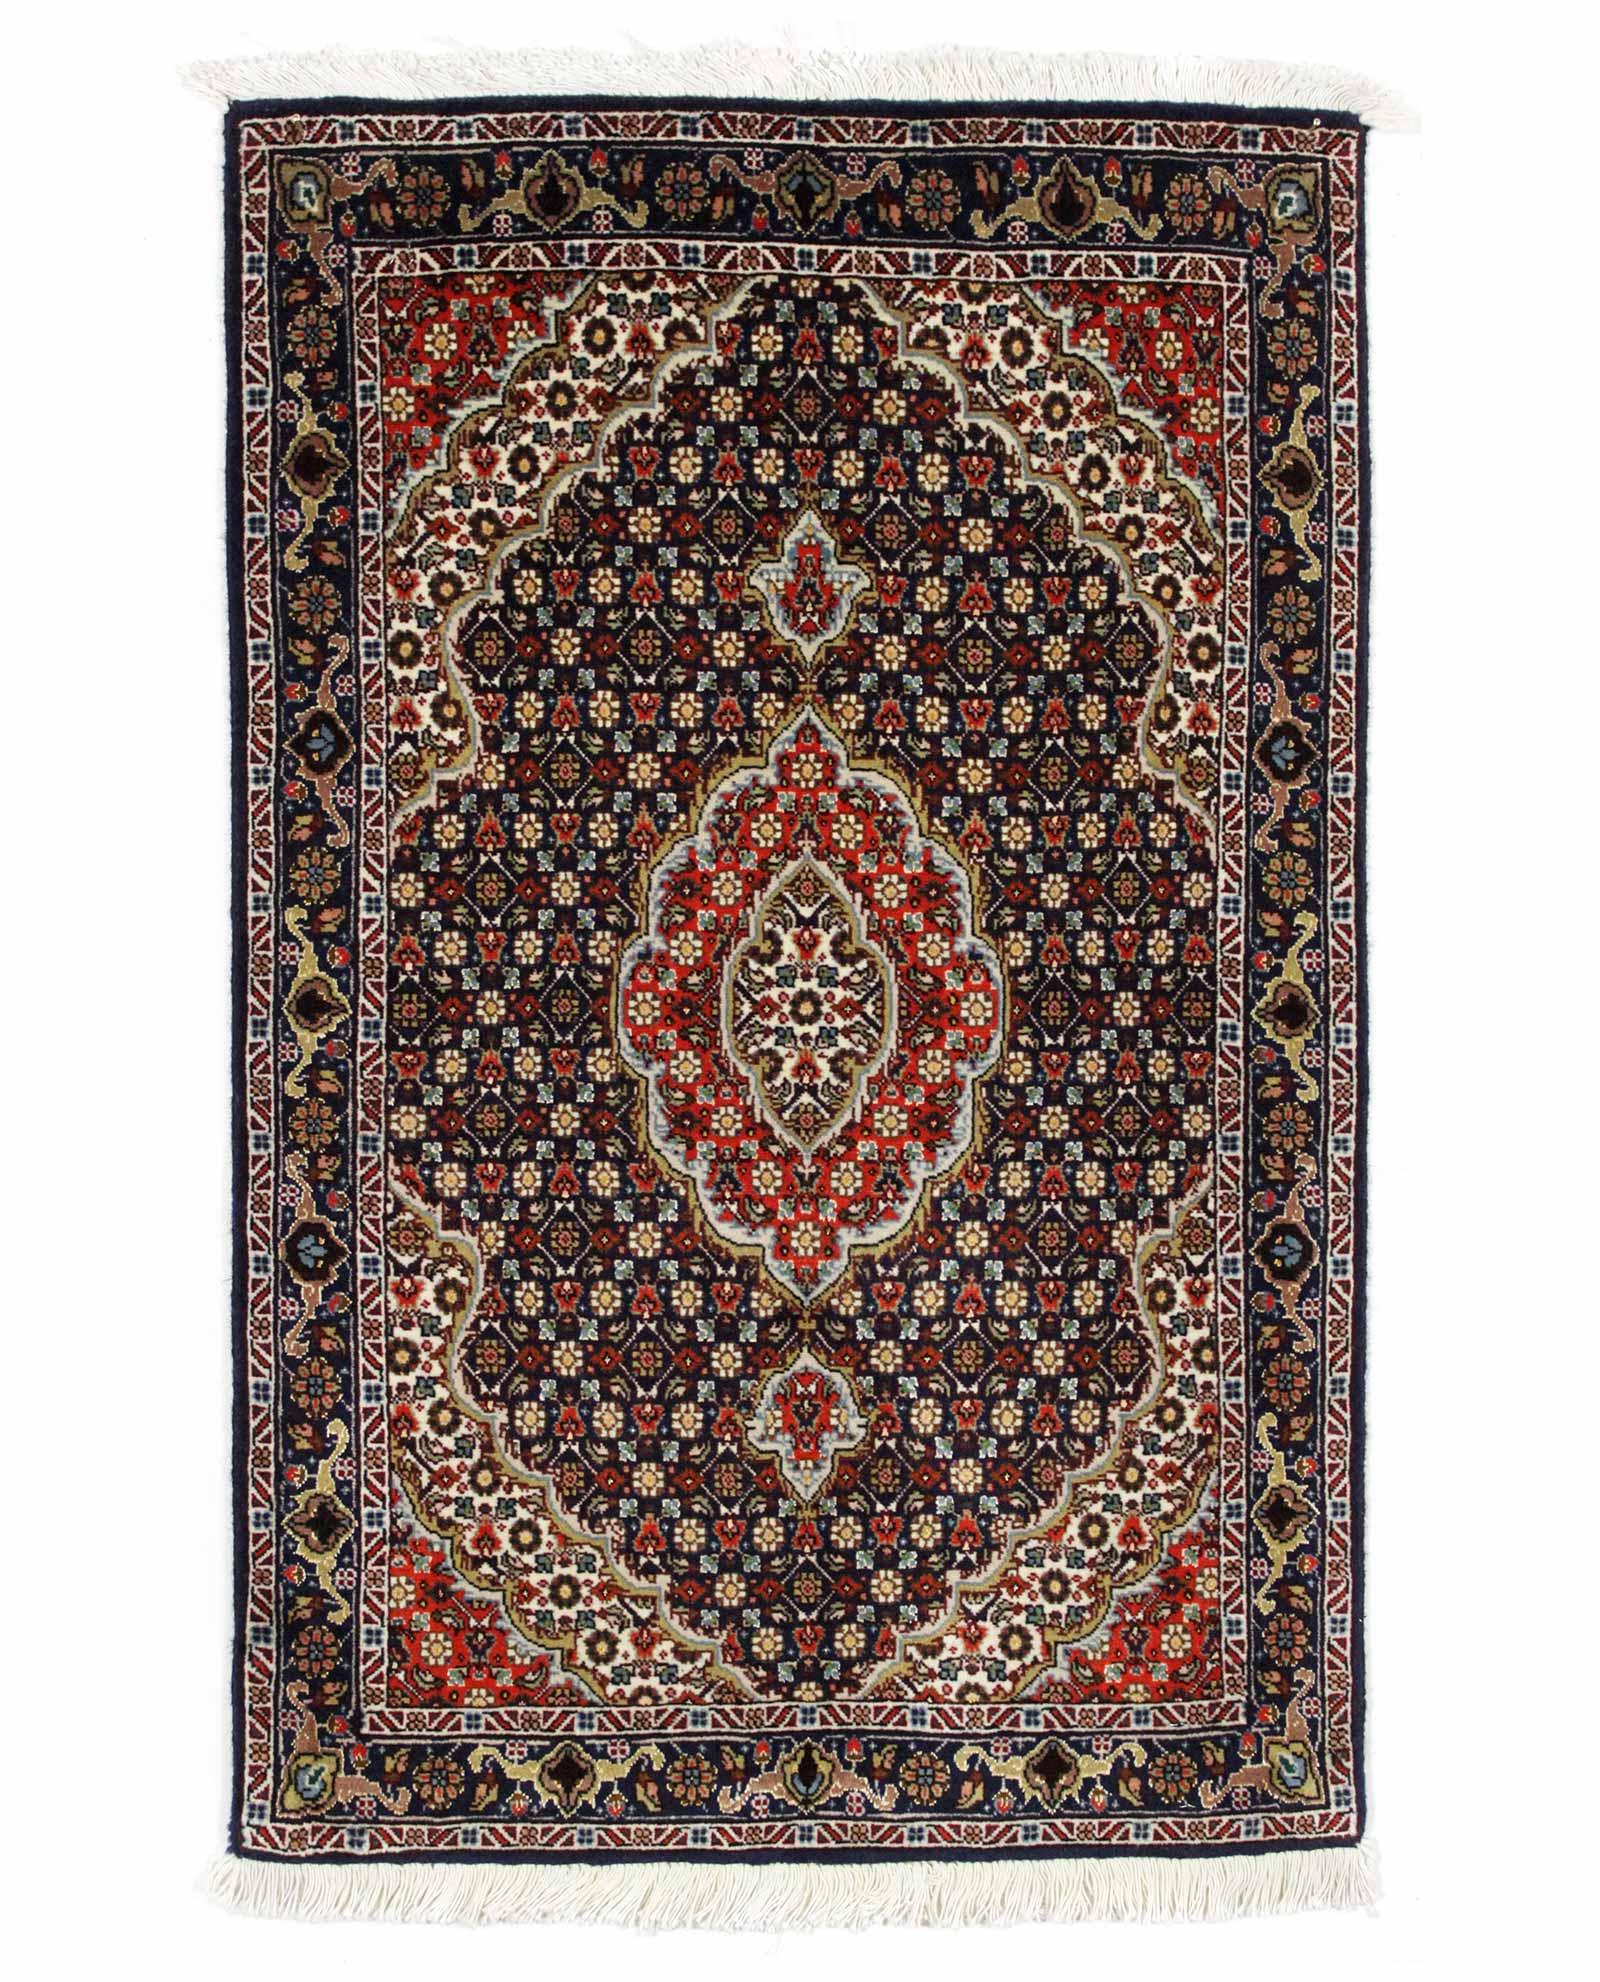 tapis persan tabriz 15004 iranian carpet. Black Bedroom Furniture Sets. Home Design Ideas